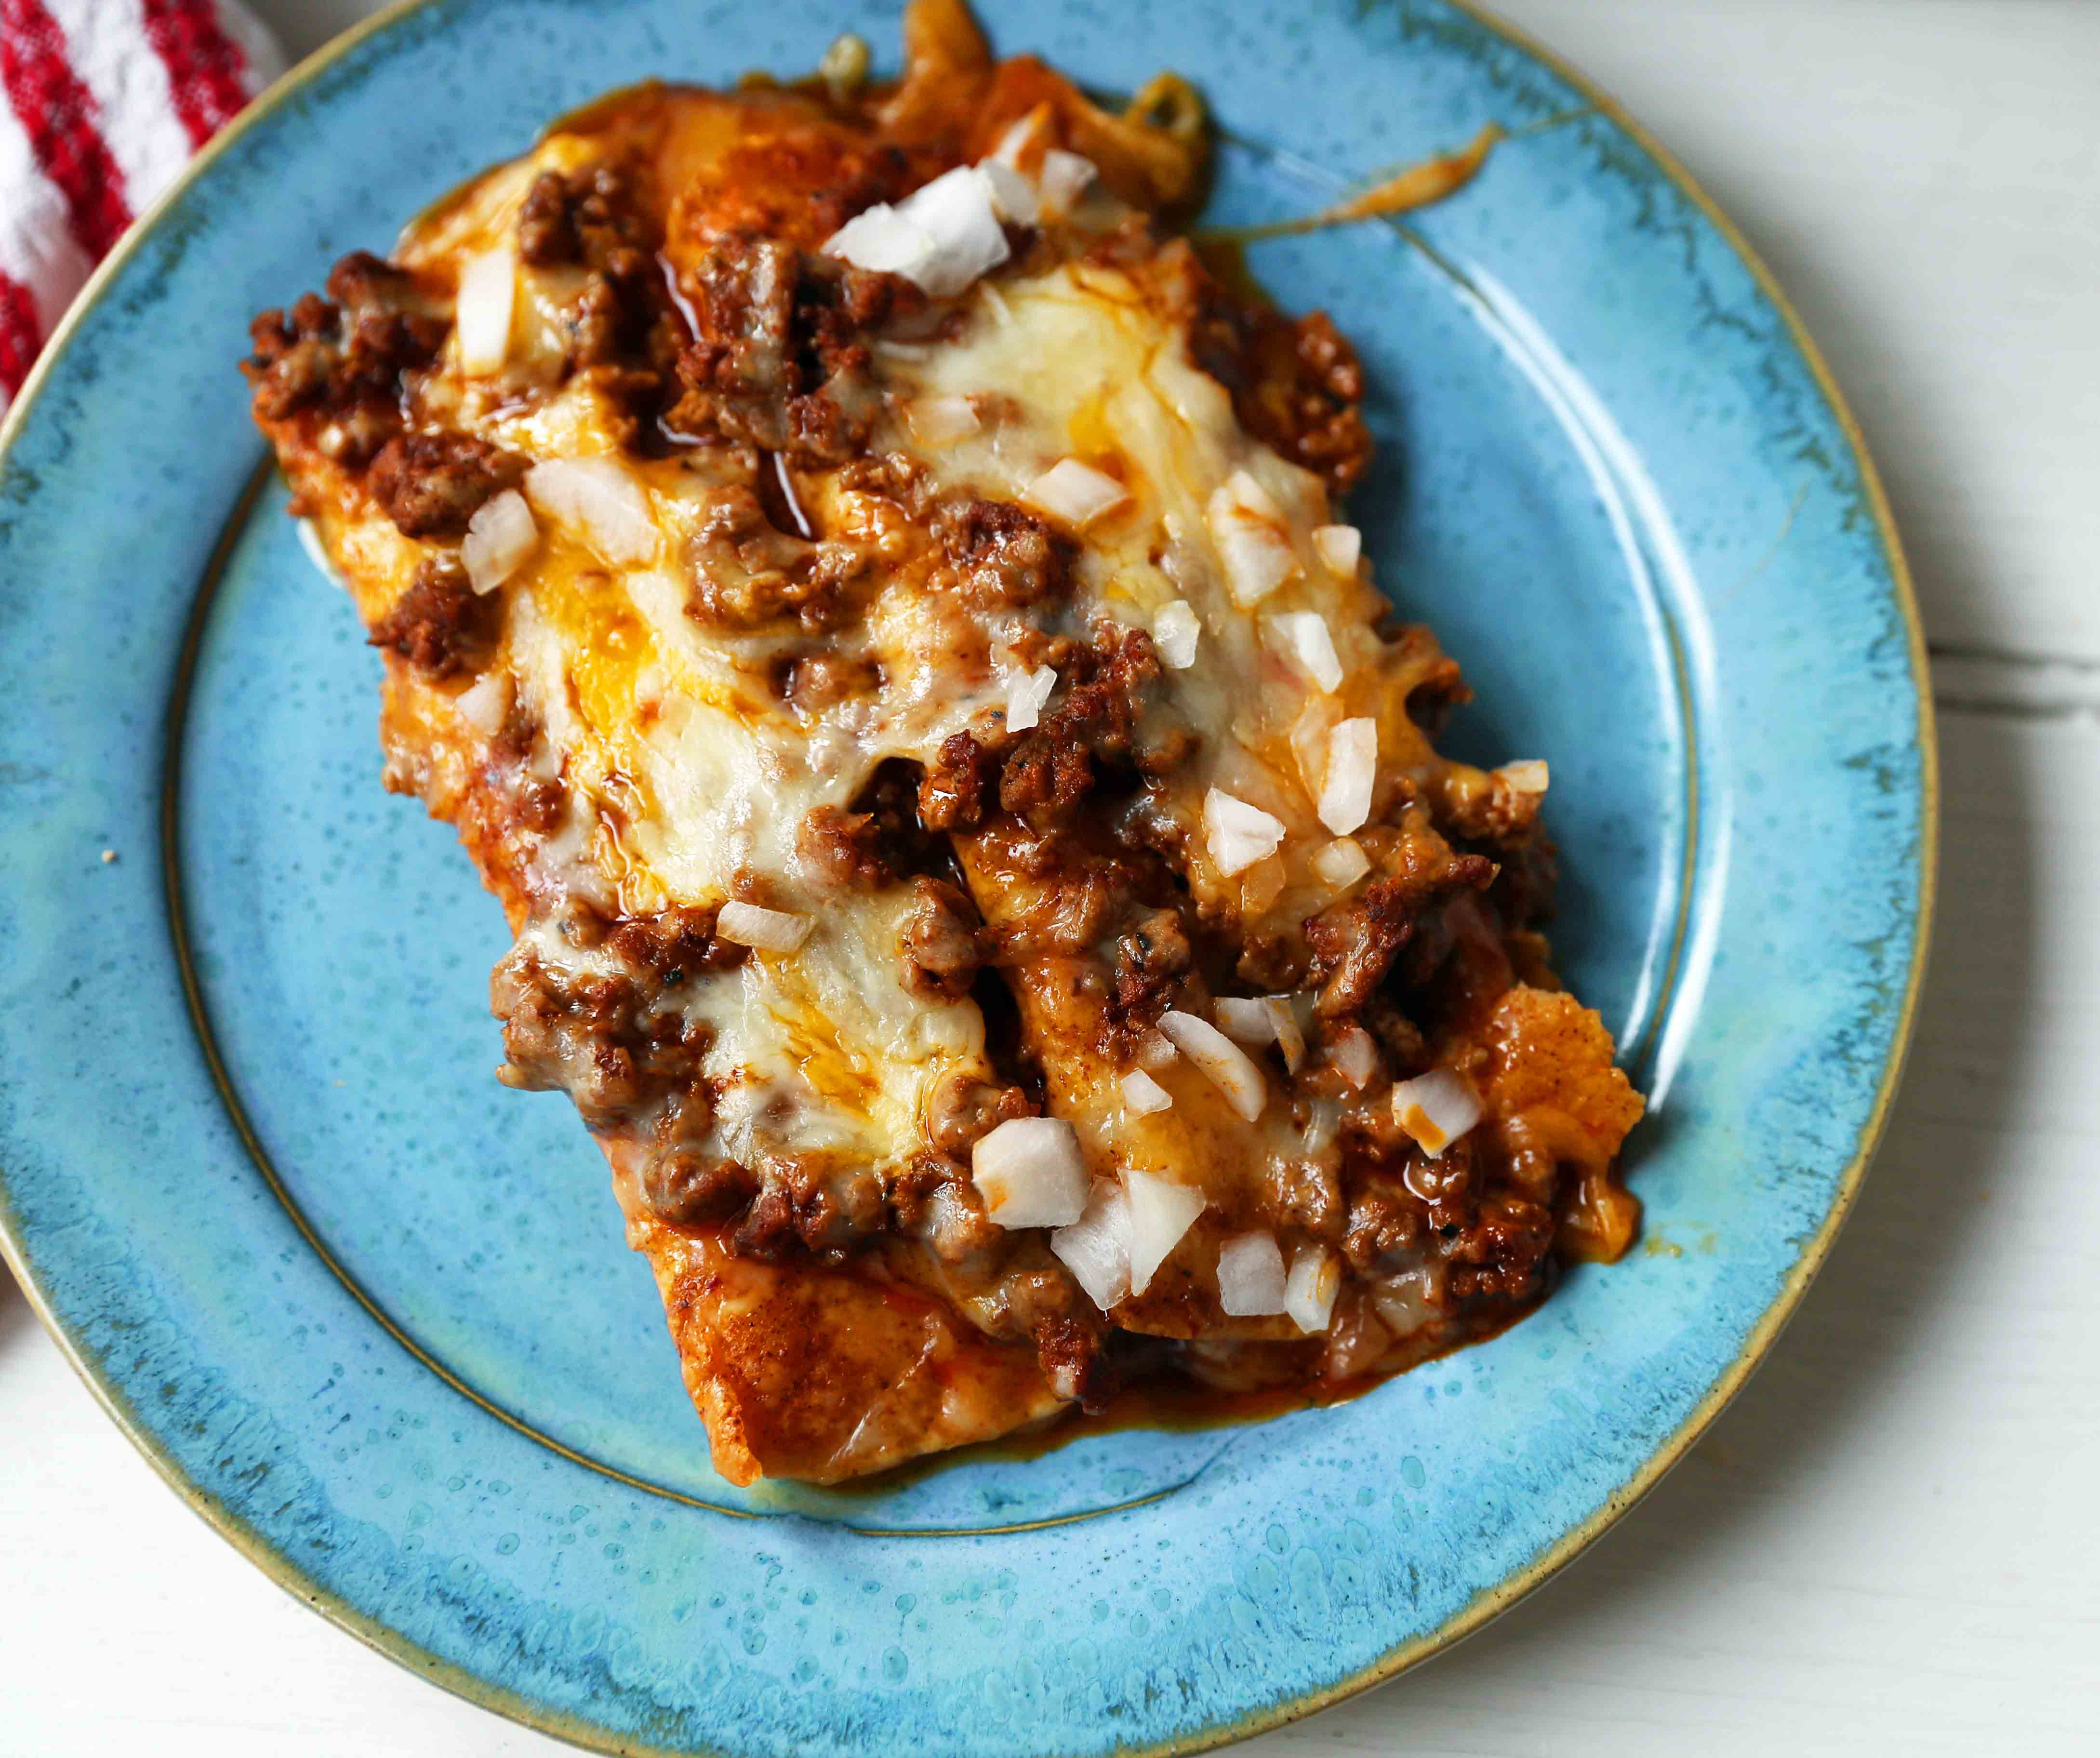 Chile con Carne Enchiladas. Authenic Tex-Mex Beef Enchiladas Recipe. Cheese Enchiladas topped with homemade chile con carne. The best chile con carne enchiladas recipe! #chiliconcarne #texmex #texmexenchiladas #enchiladas #mexicanfood